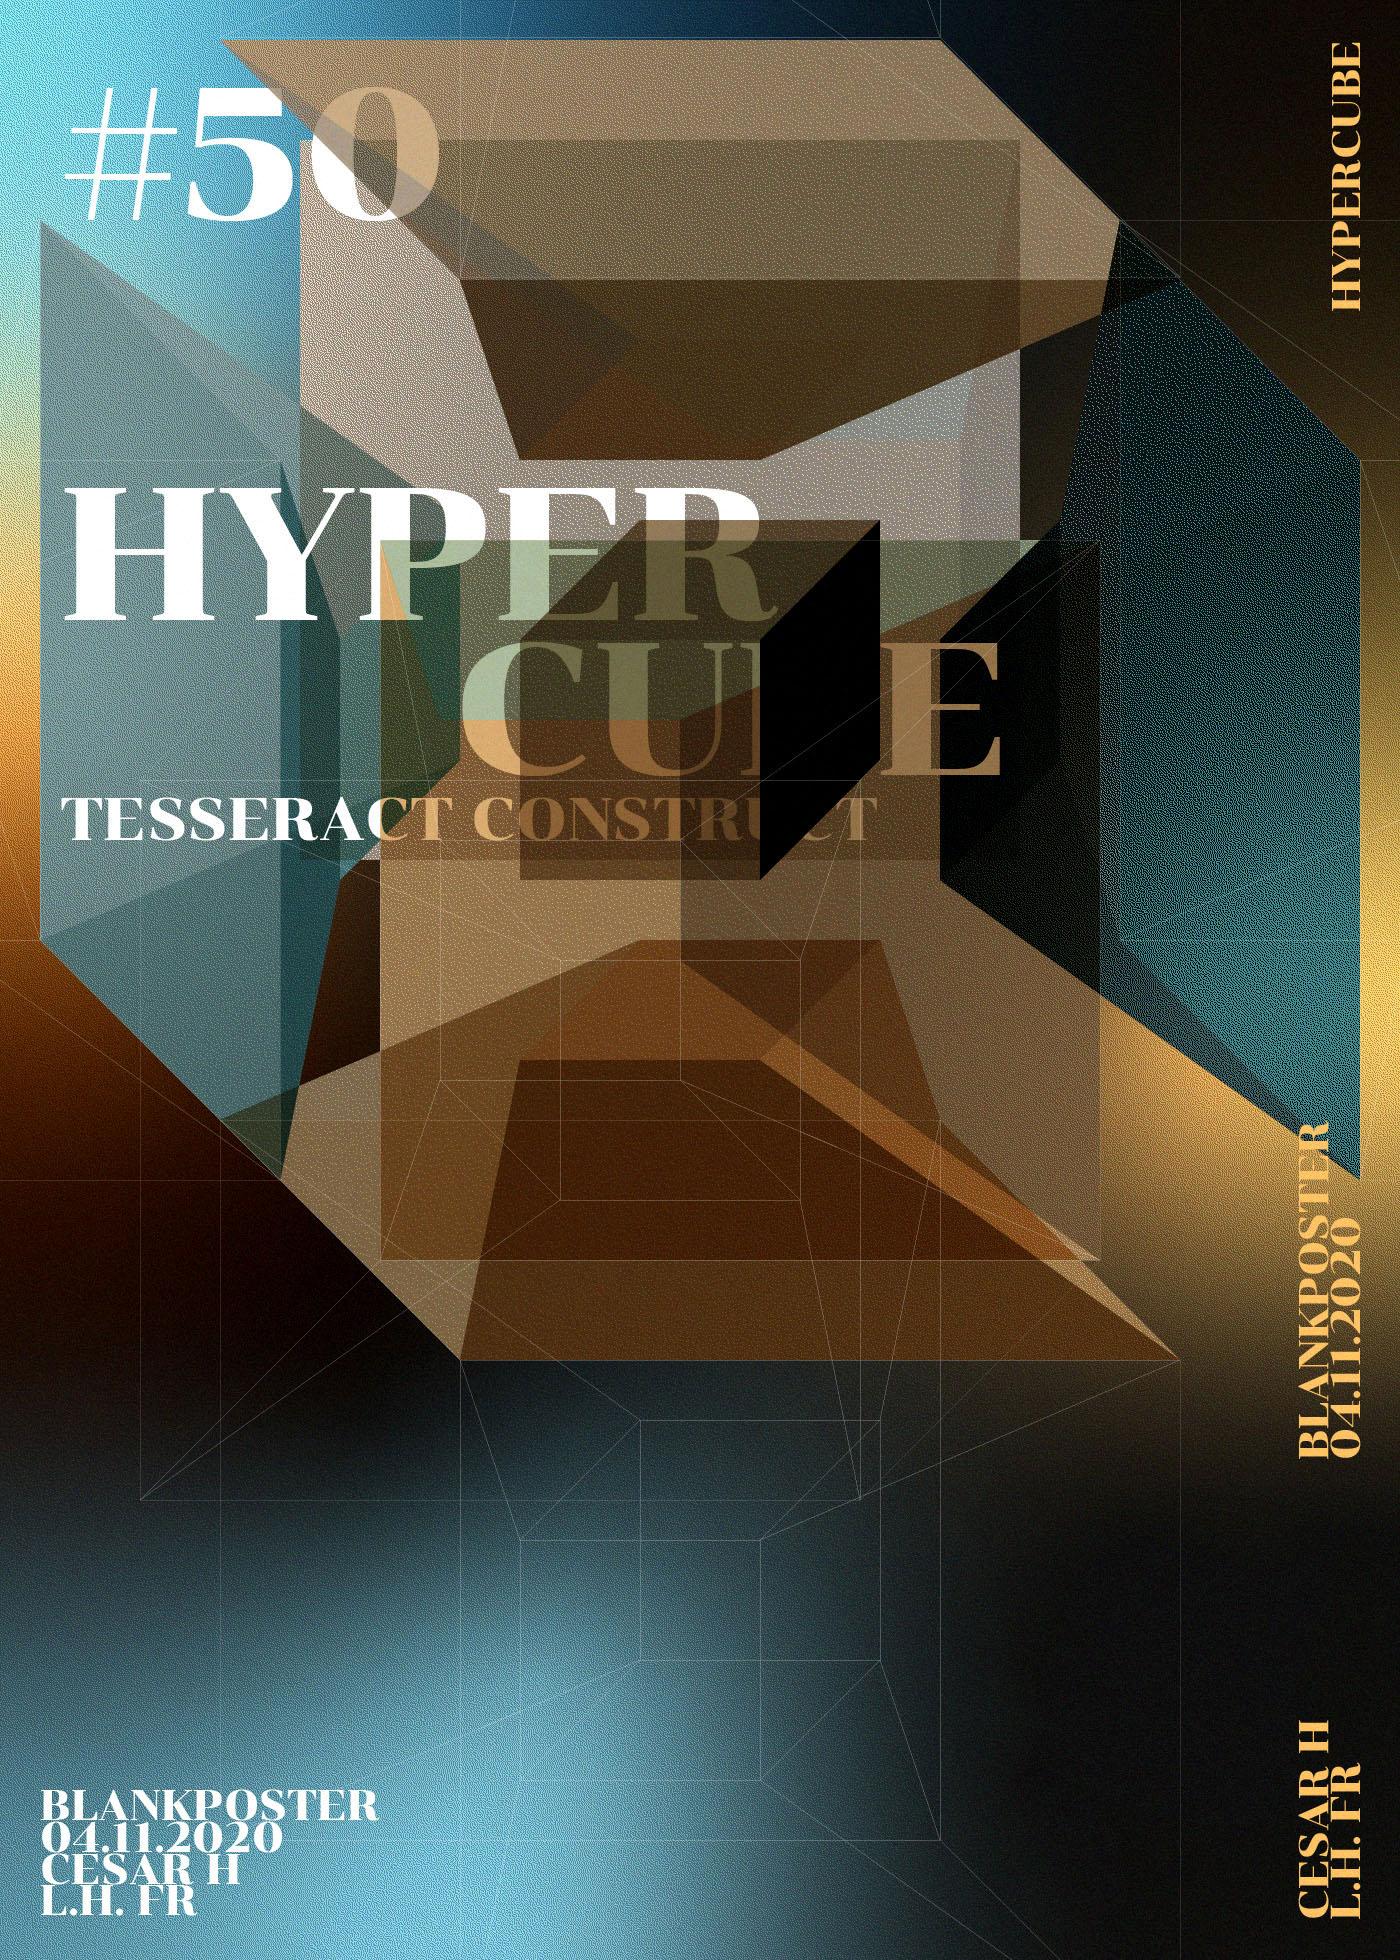 Blankposter :: Hypercube